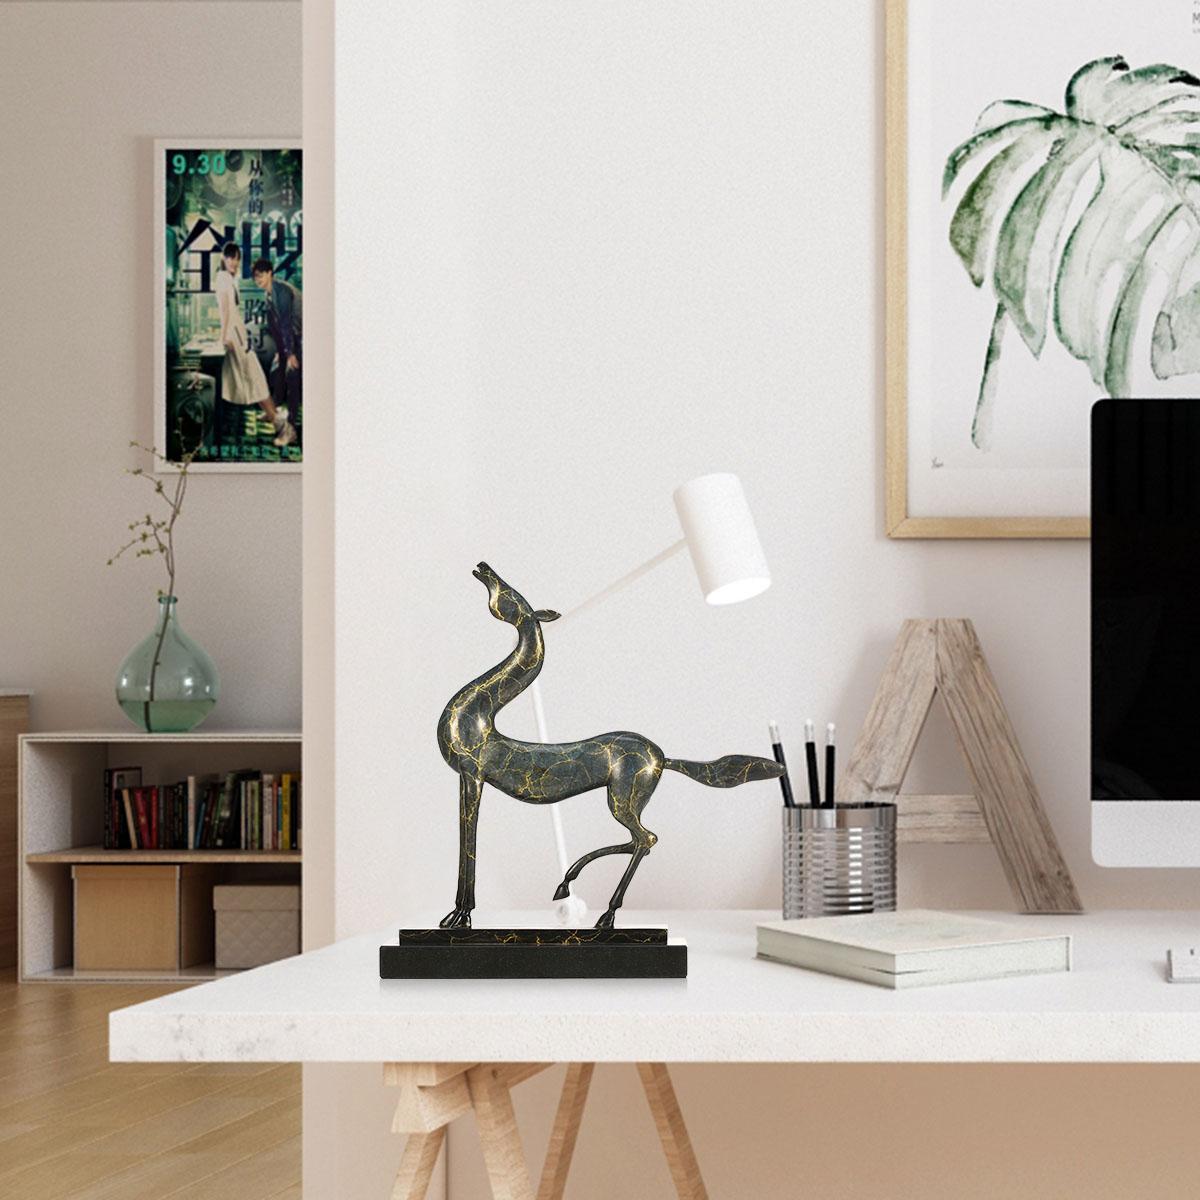 Raising Head Horse Decor Statue Gifts Home Decoration Accents Modern  Collectible Figurine Art Artist Designed Handmade Sculpture